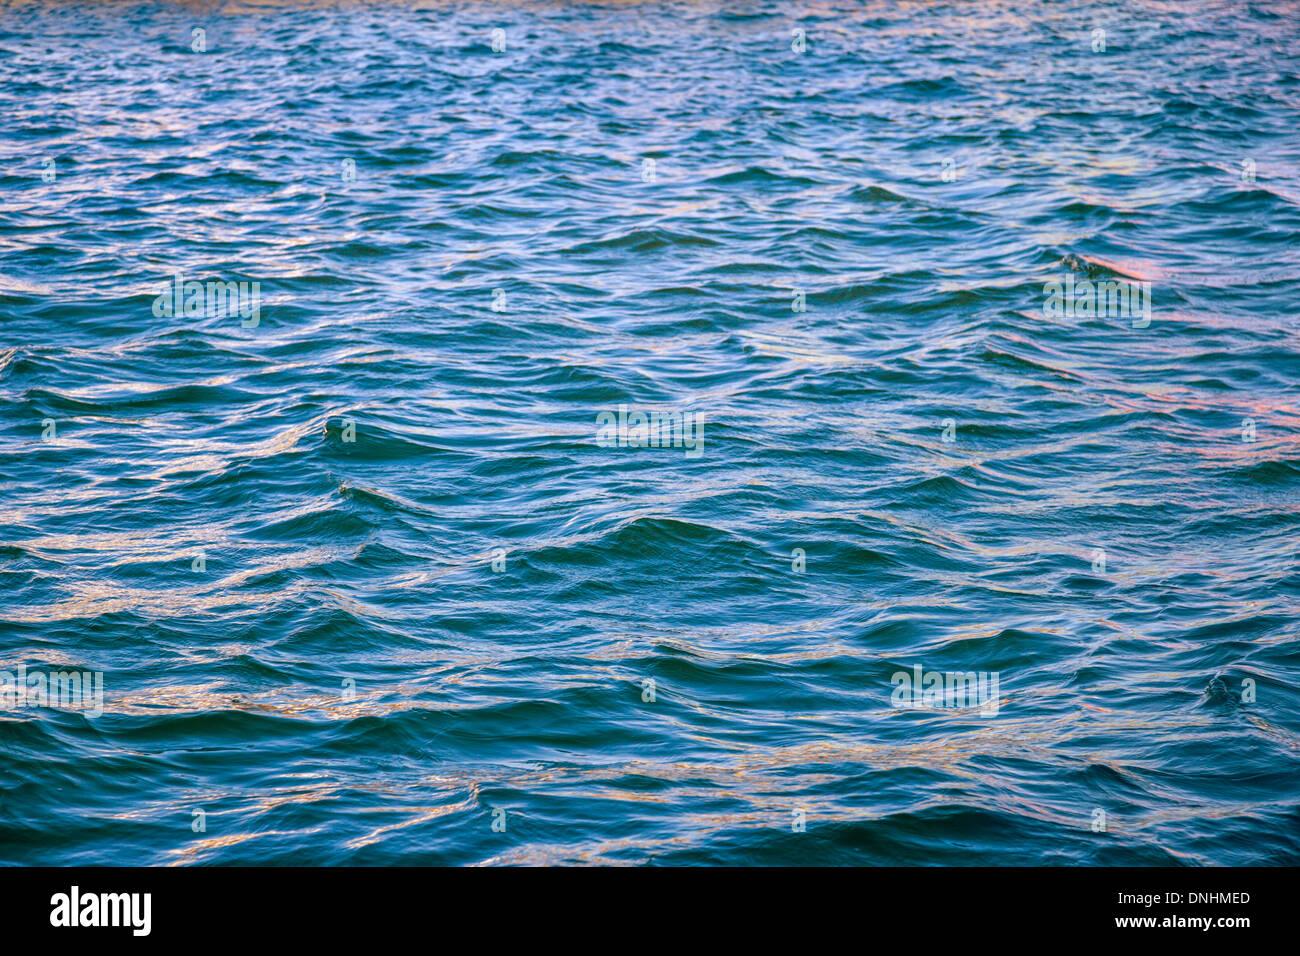 Waves in the sea, Barcelona, Catalonia, Spain Stock Photo